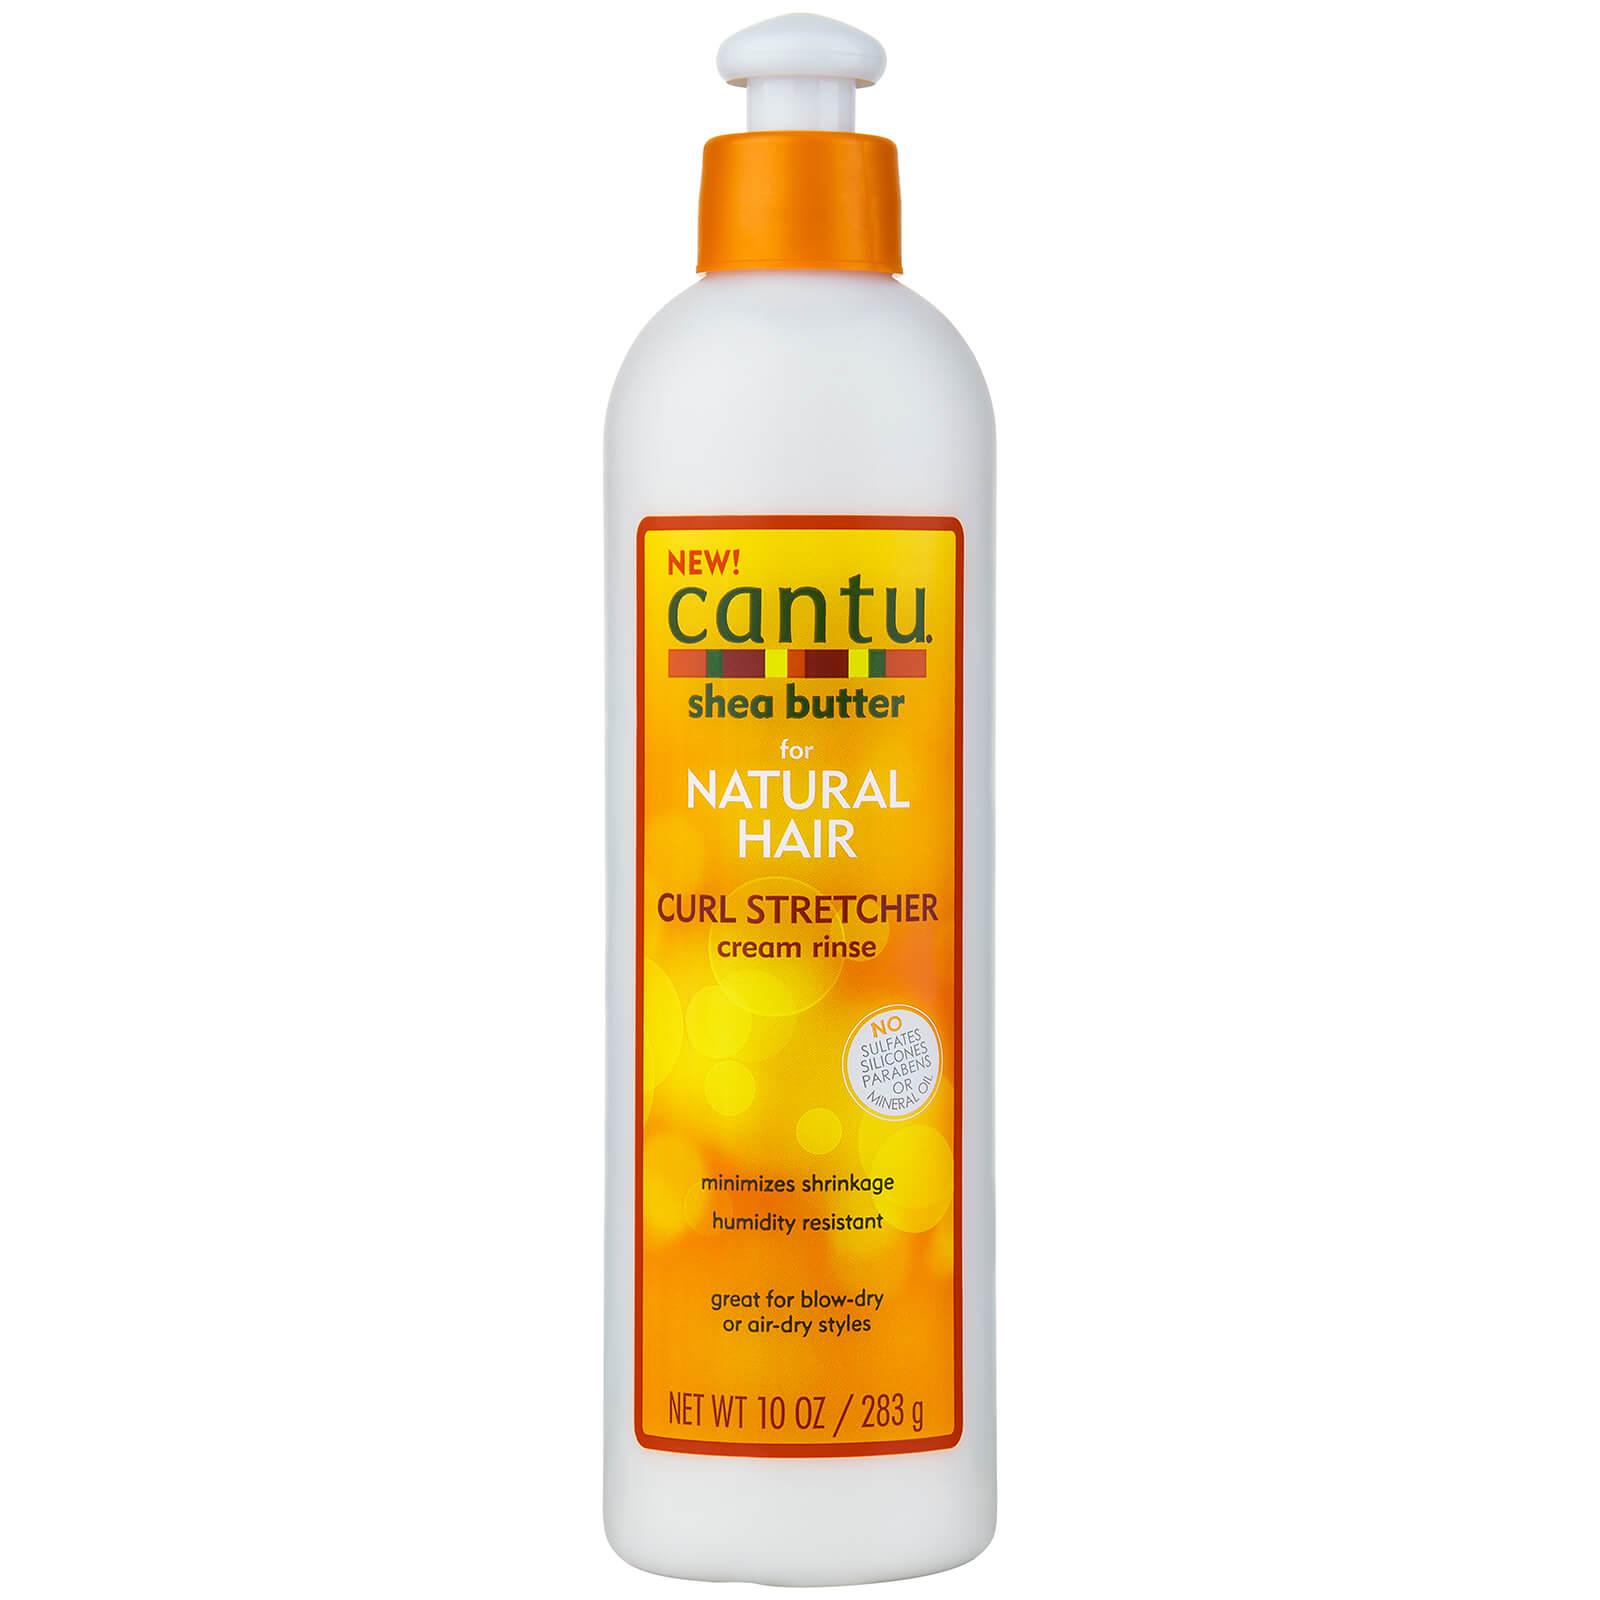 Купить Cantu Shea Butter for Natural Hair Curl Stretcher Cream Rinse 10 oz